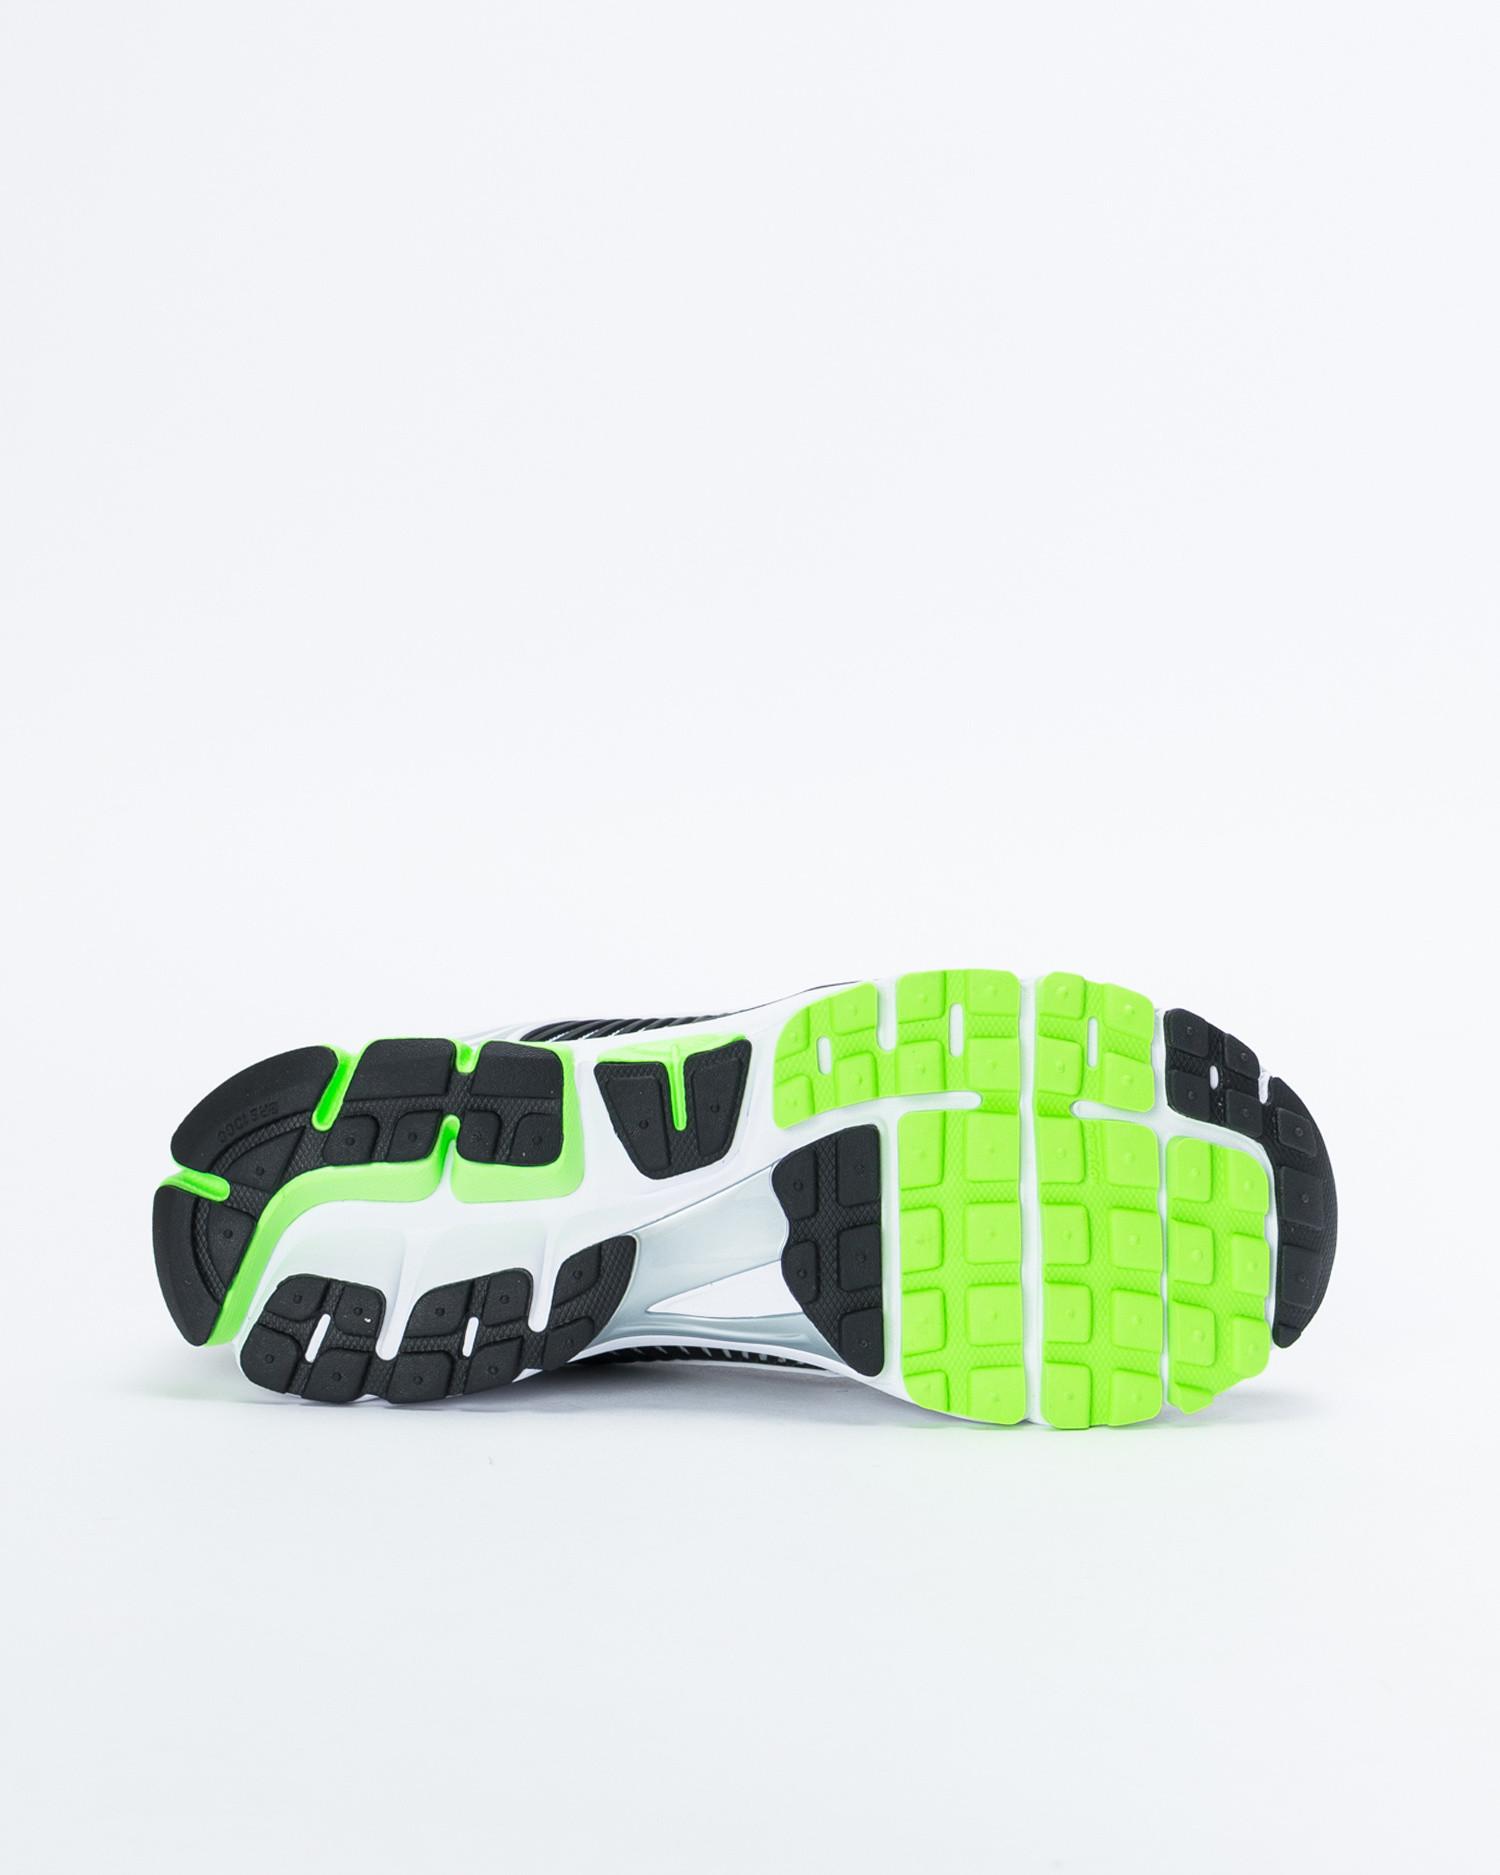 Nike Zoom Vomero 5 Se SP electric green/black-white-sail